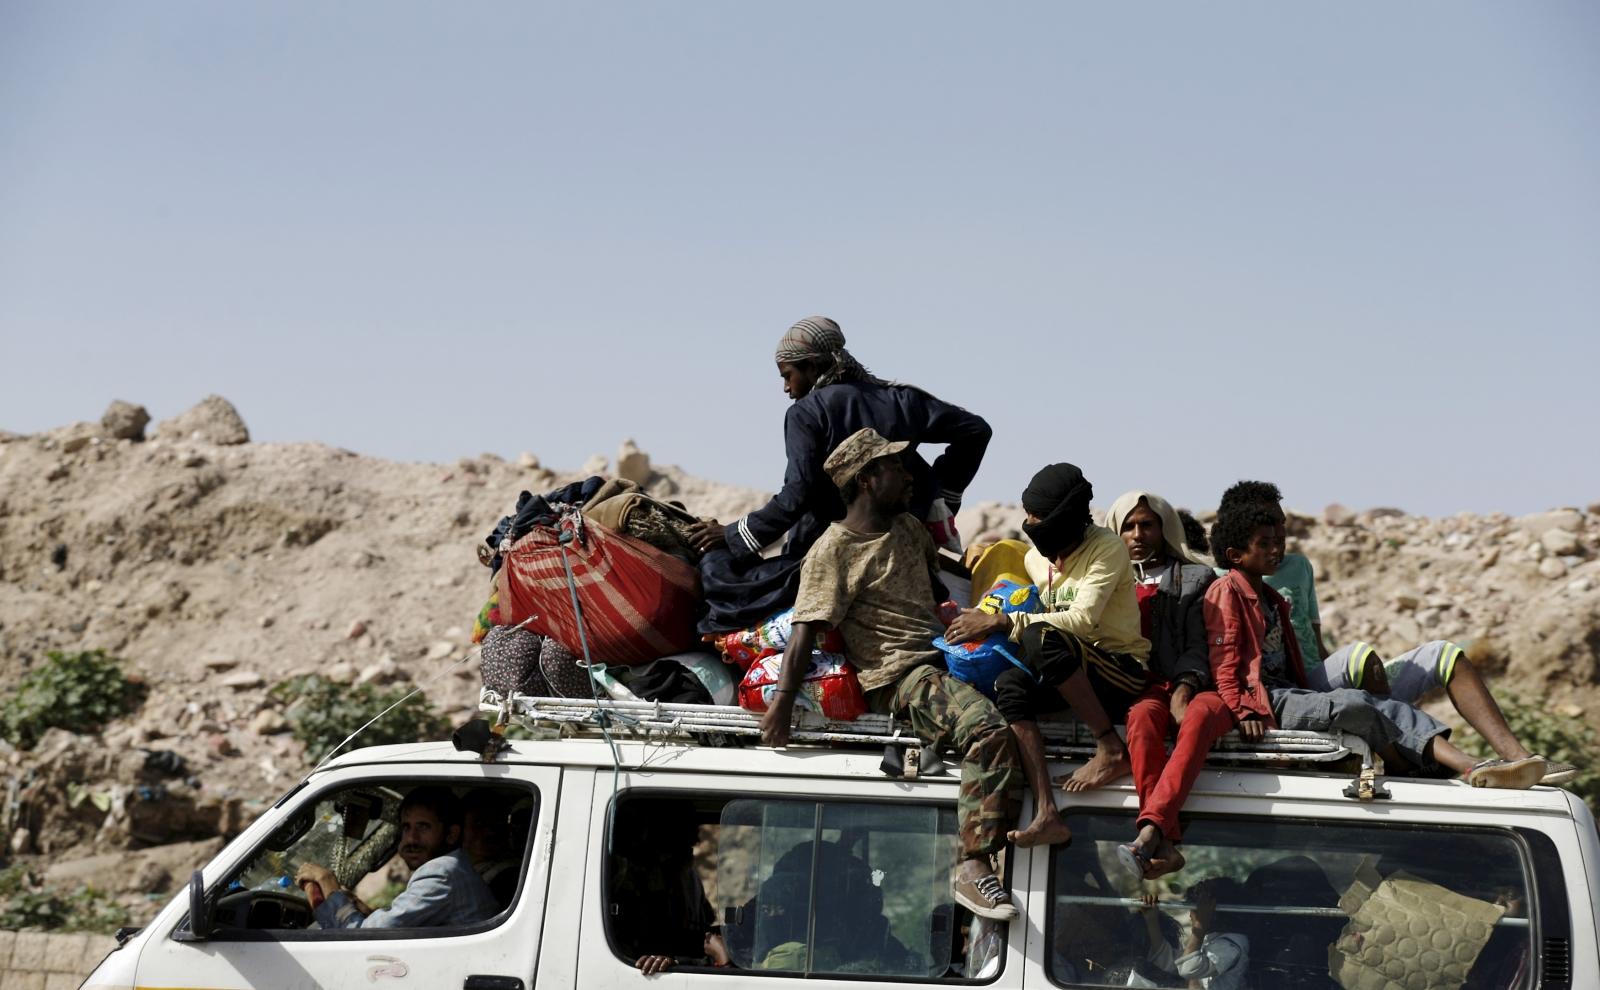 Yemen conflict and Iran aid vessel